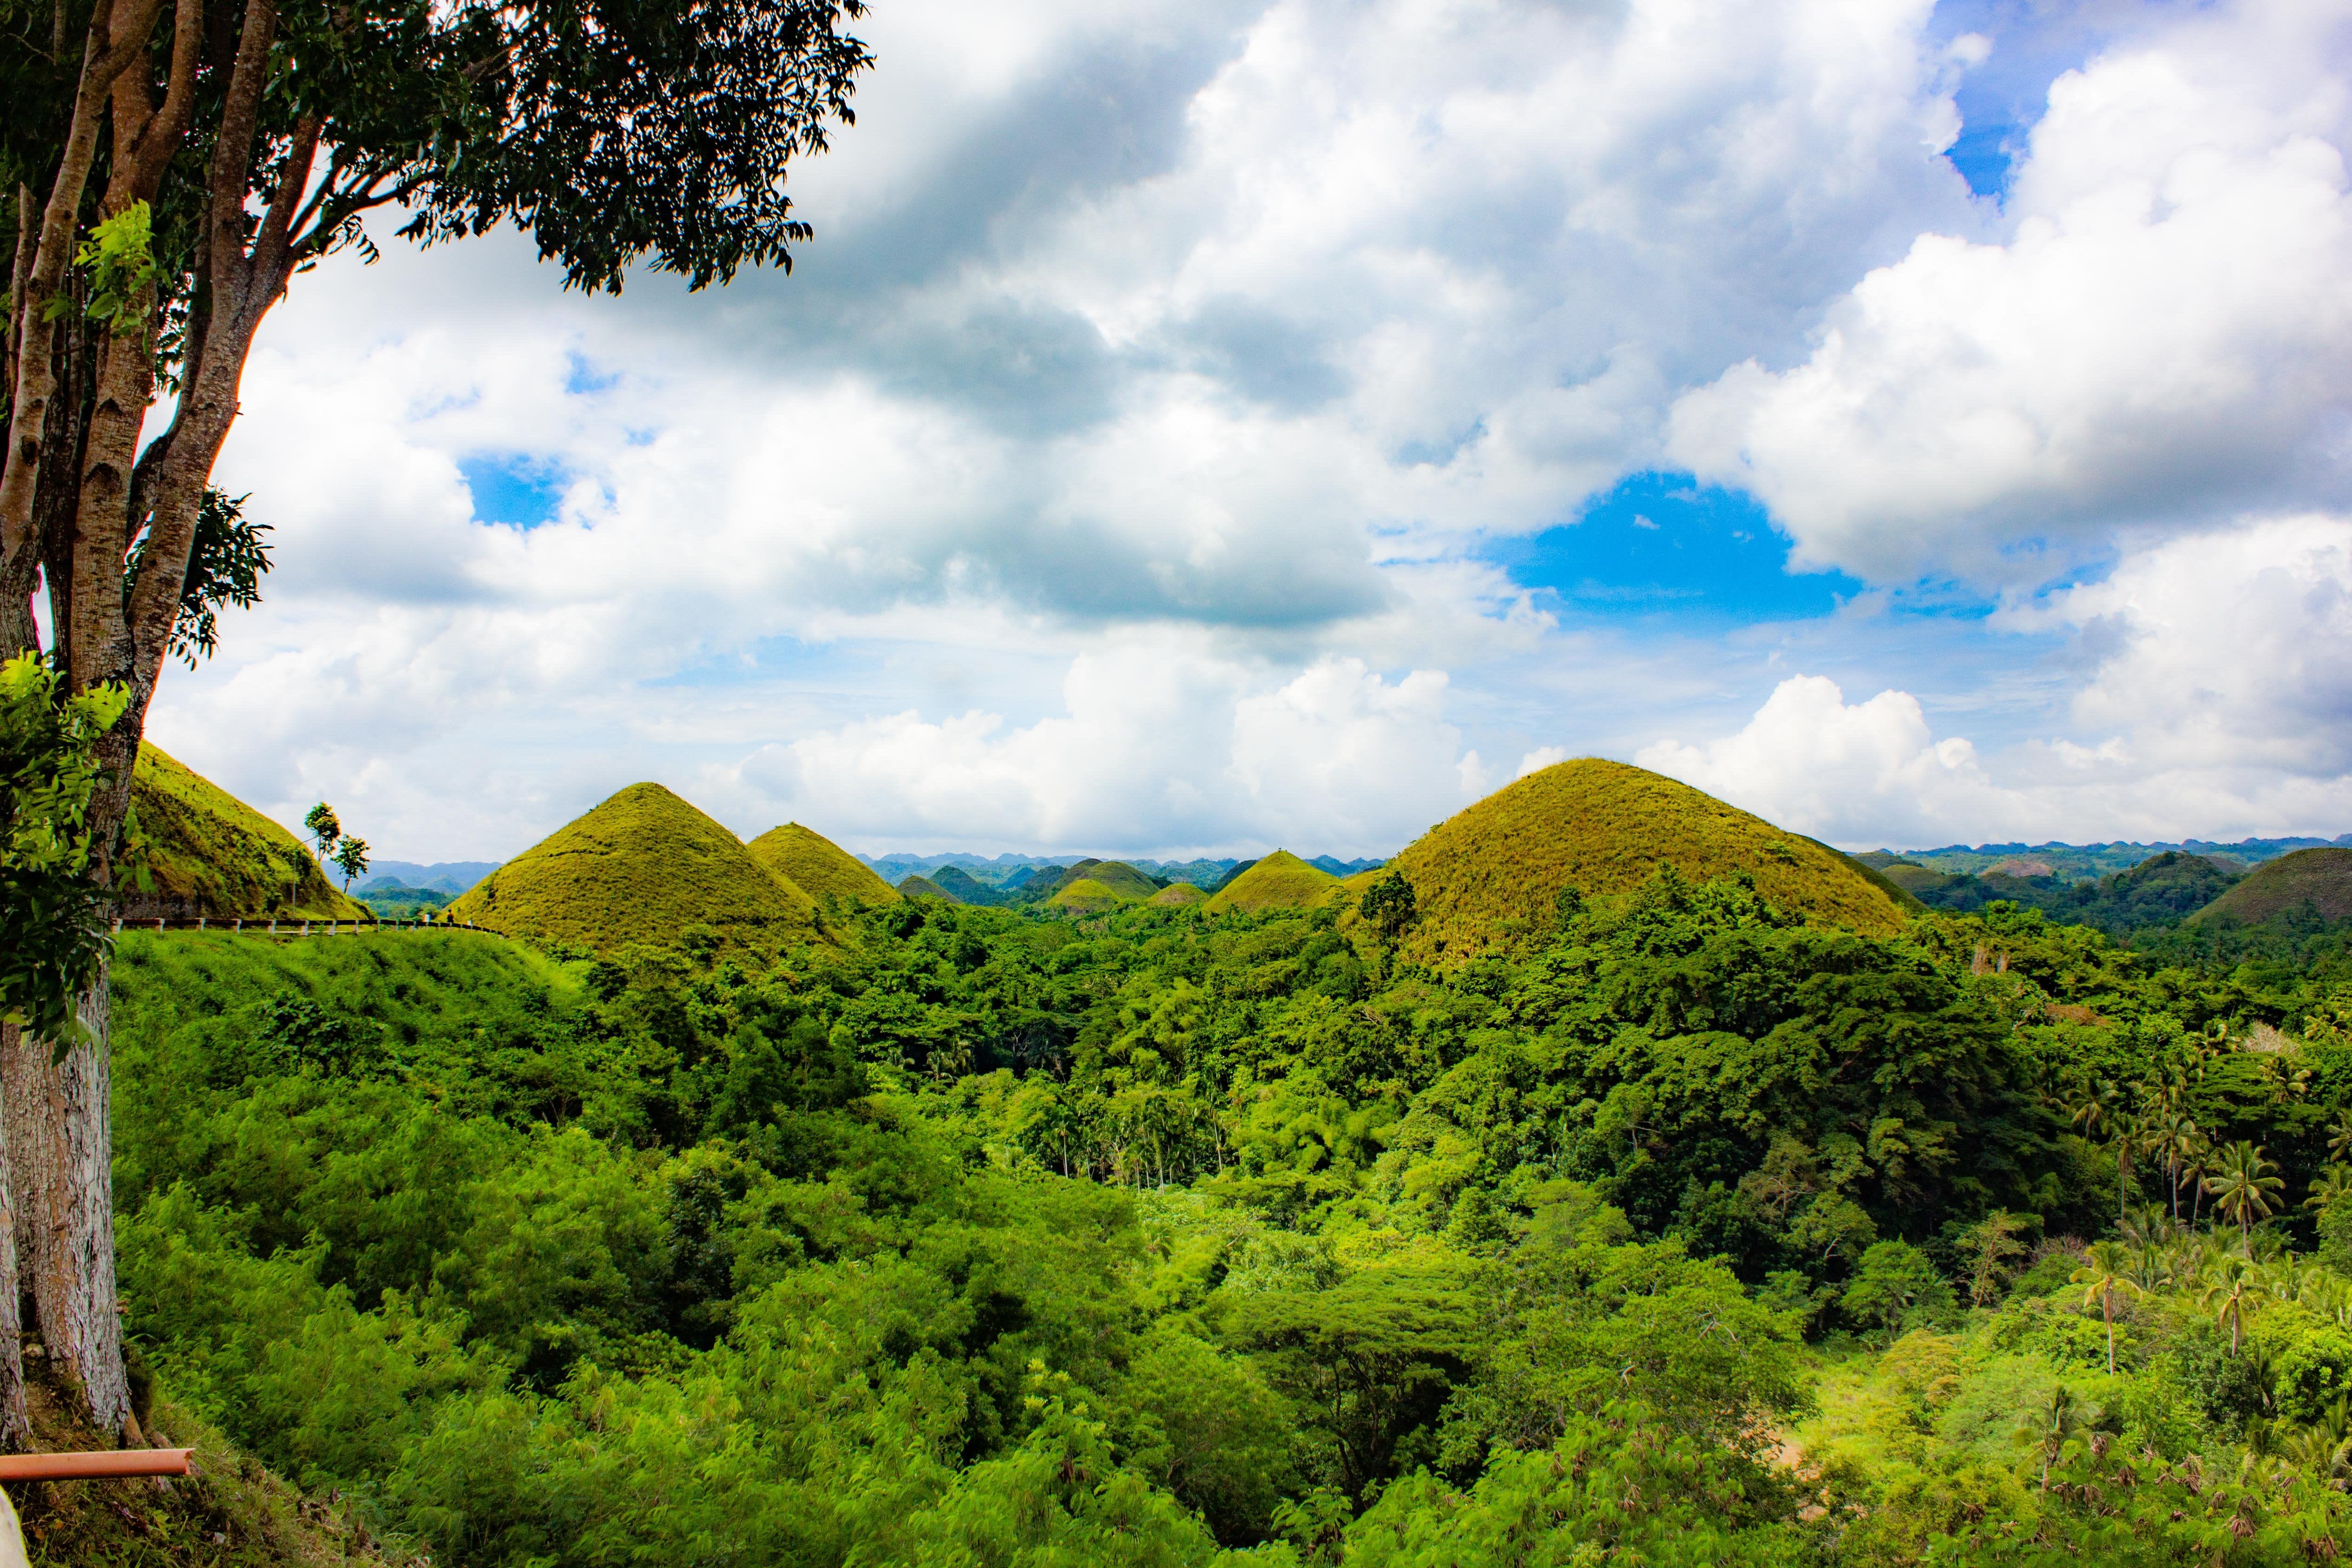 Bohol tree tops